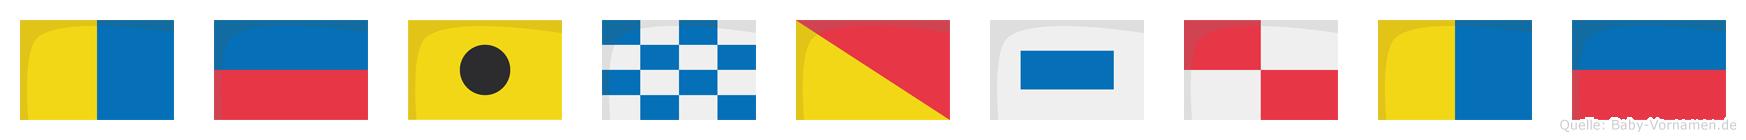 Keinosuke im Flaggenalphabet